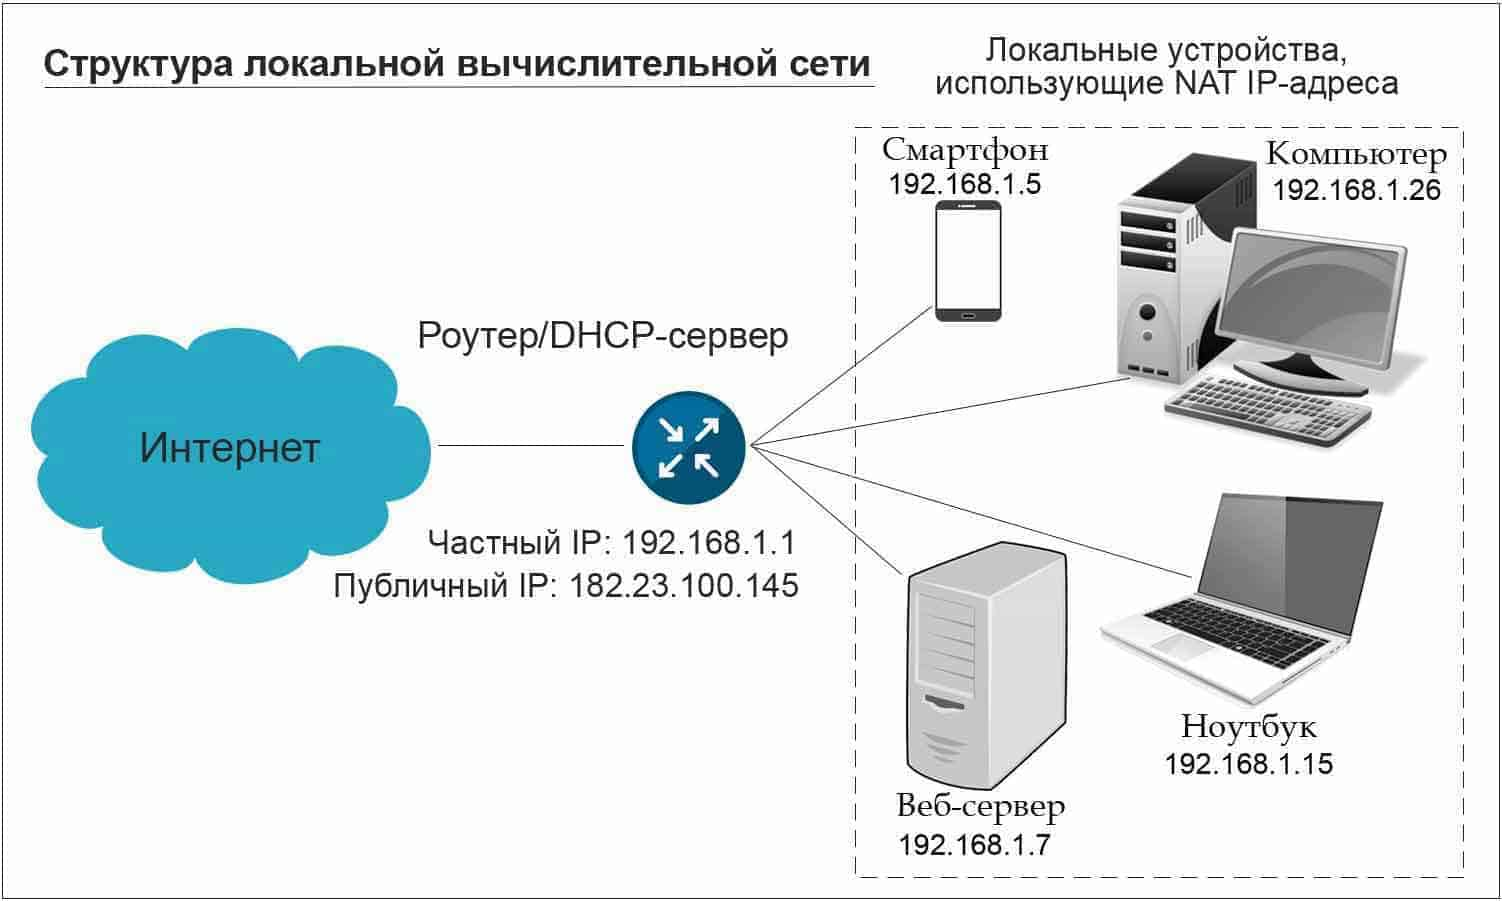 Структура локальной сети